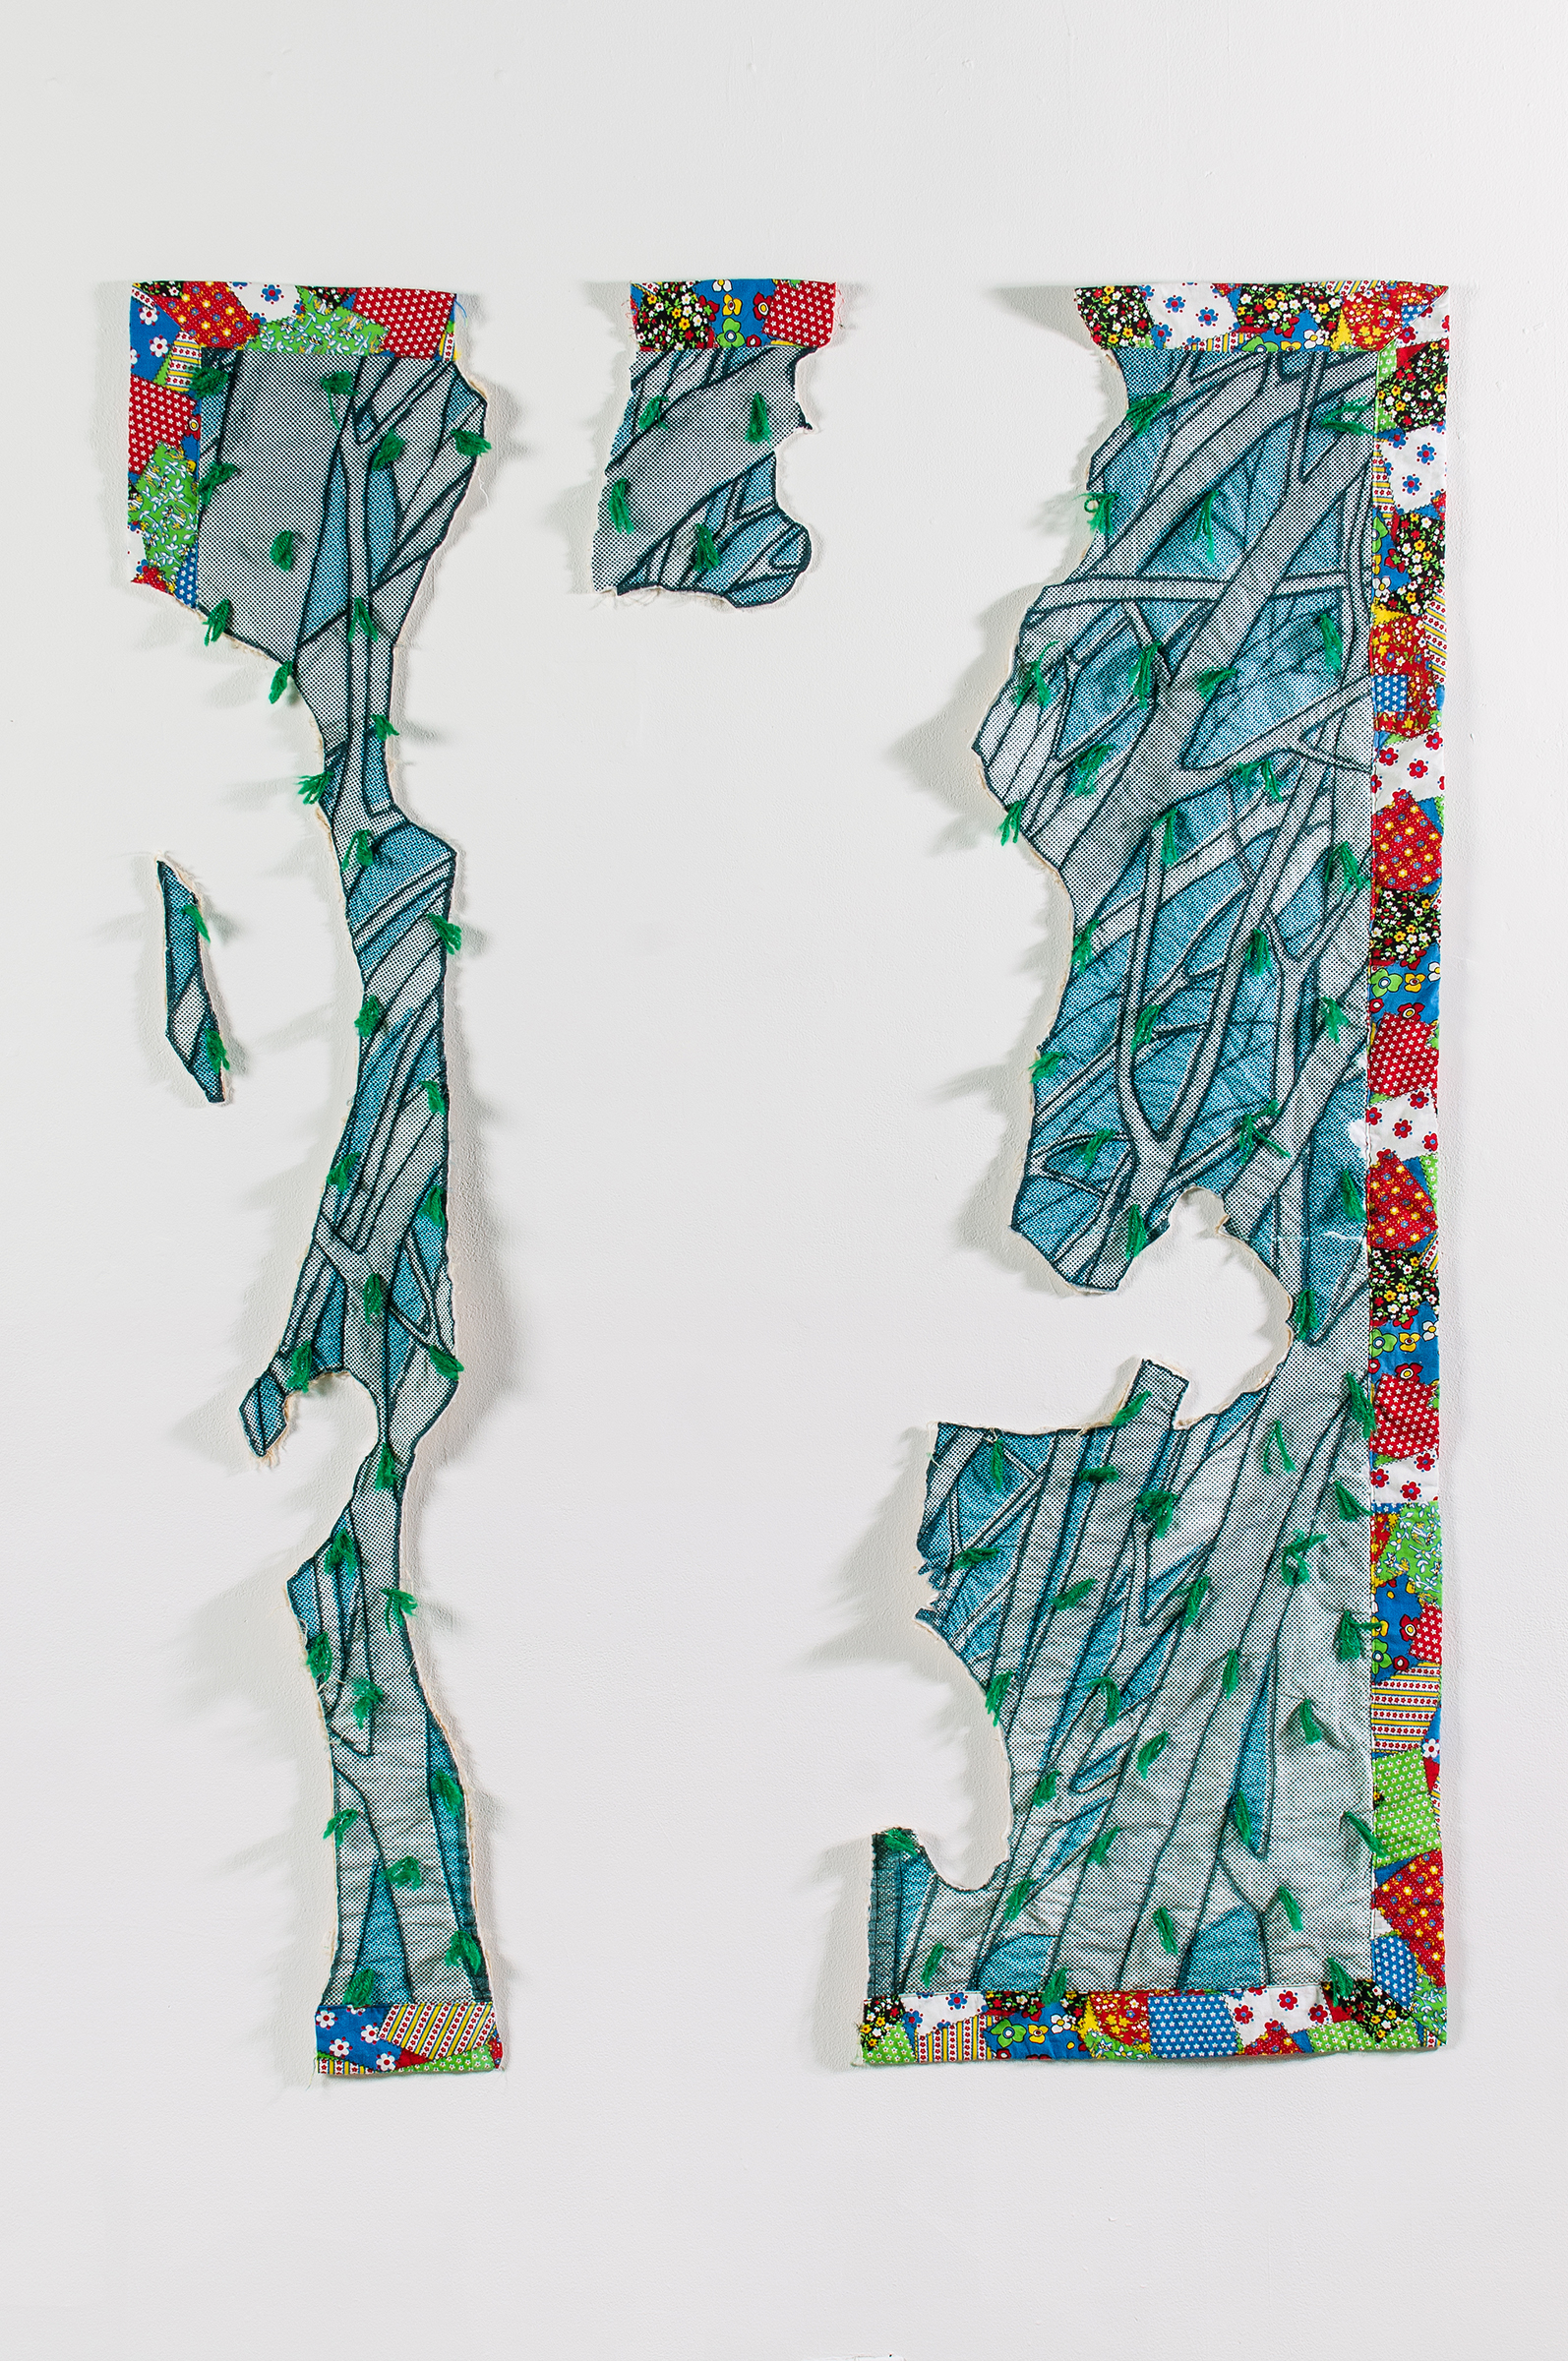 Aaron McIntosh,  Forest Frolic , 2013  Vintage cotton fabric, digital textile print, batting, thread, acrylic yarn ties  Image courtesy of the artist